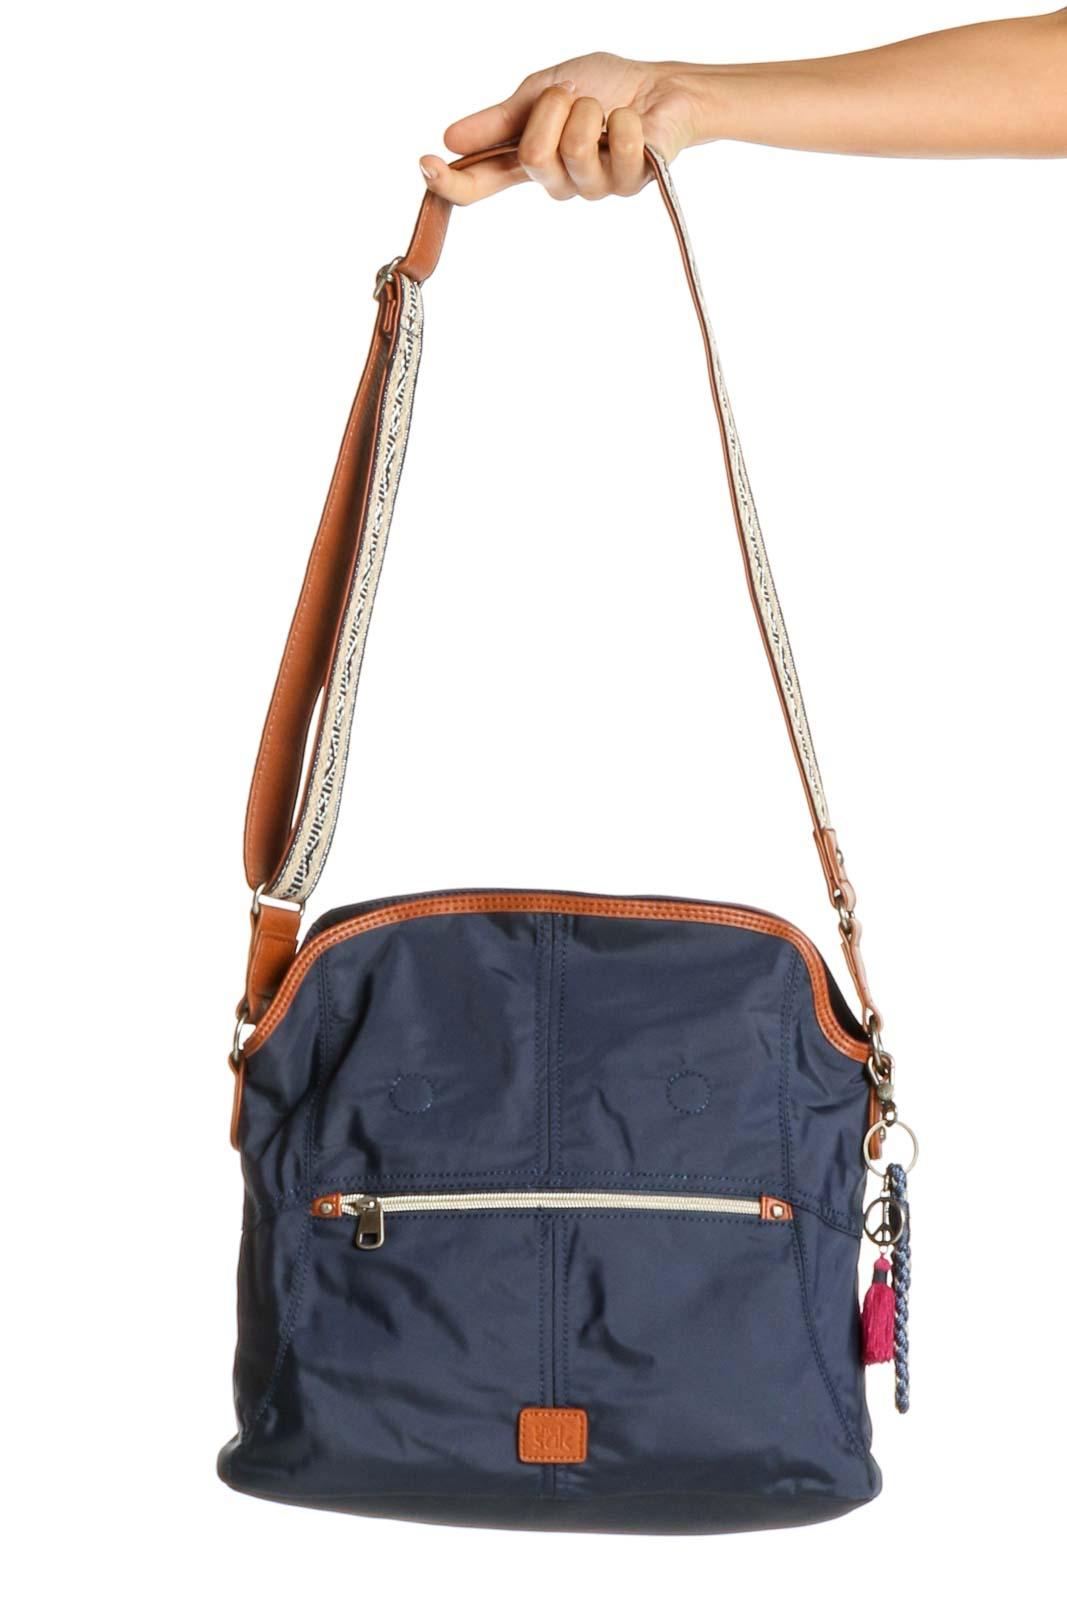 Blue Crossbody Bag Front